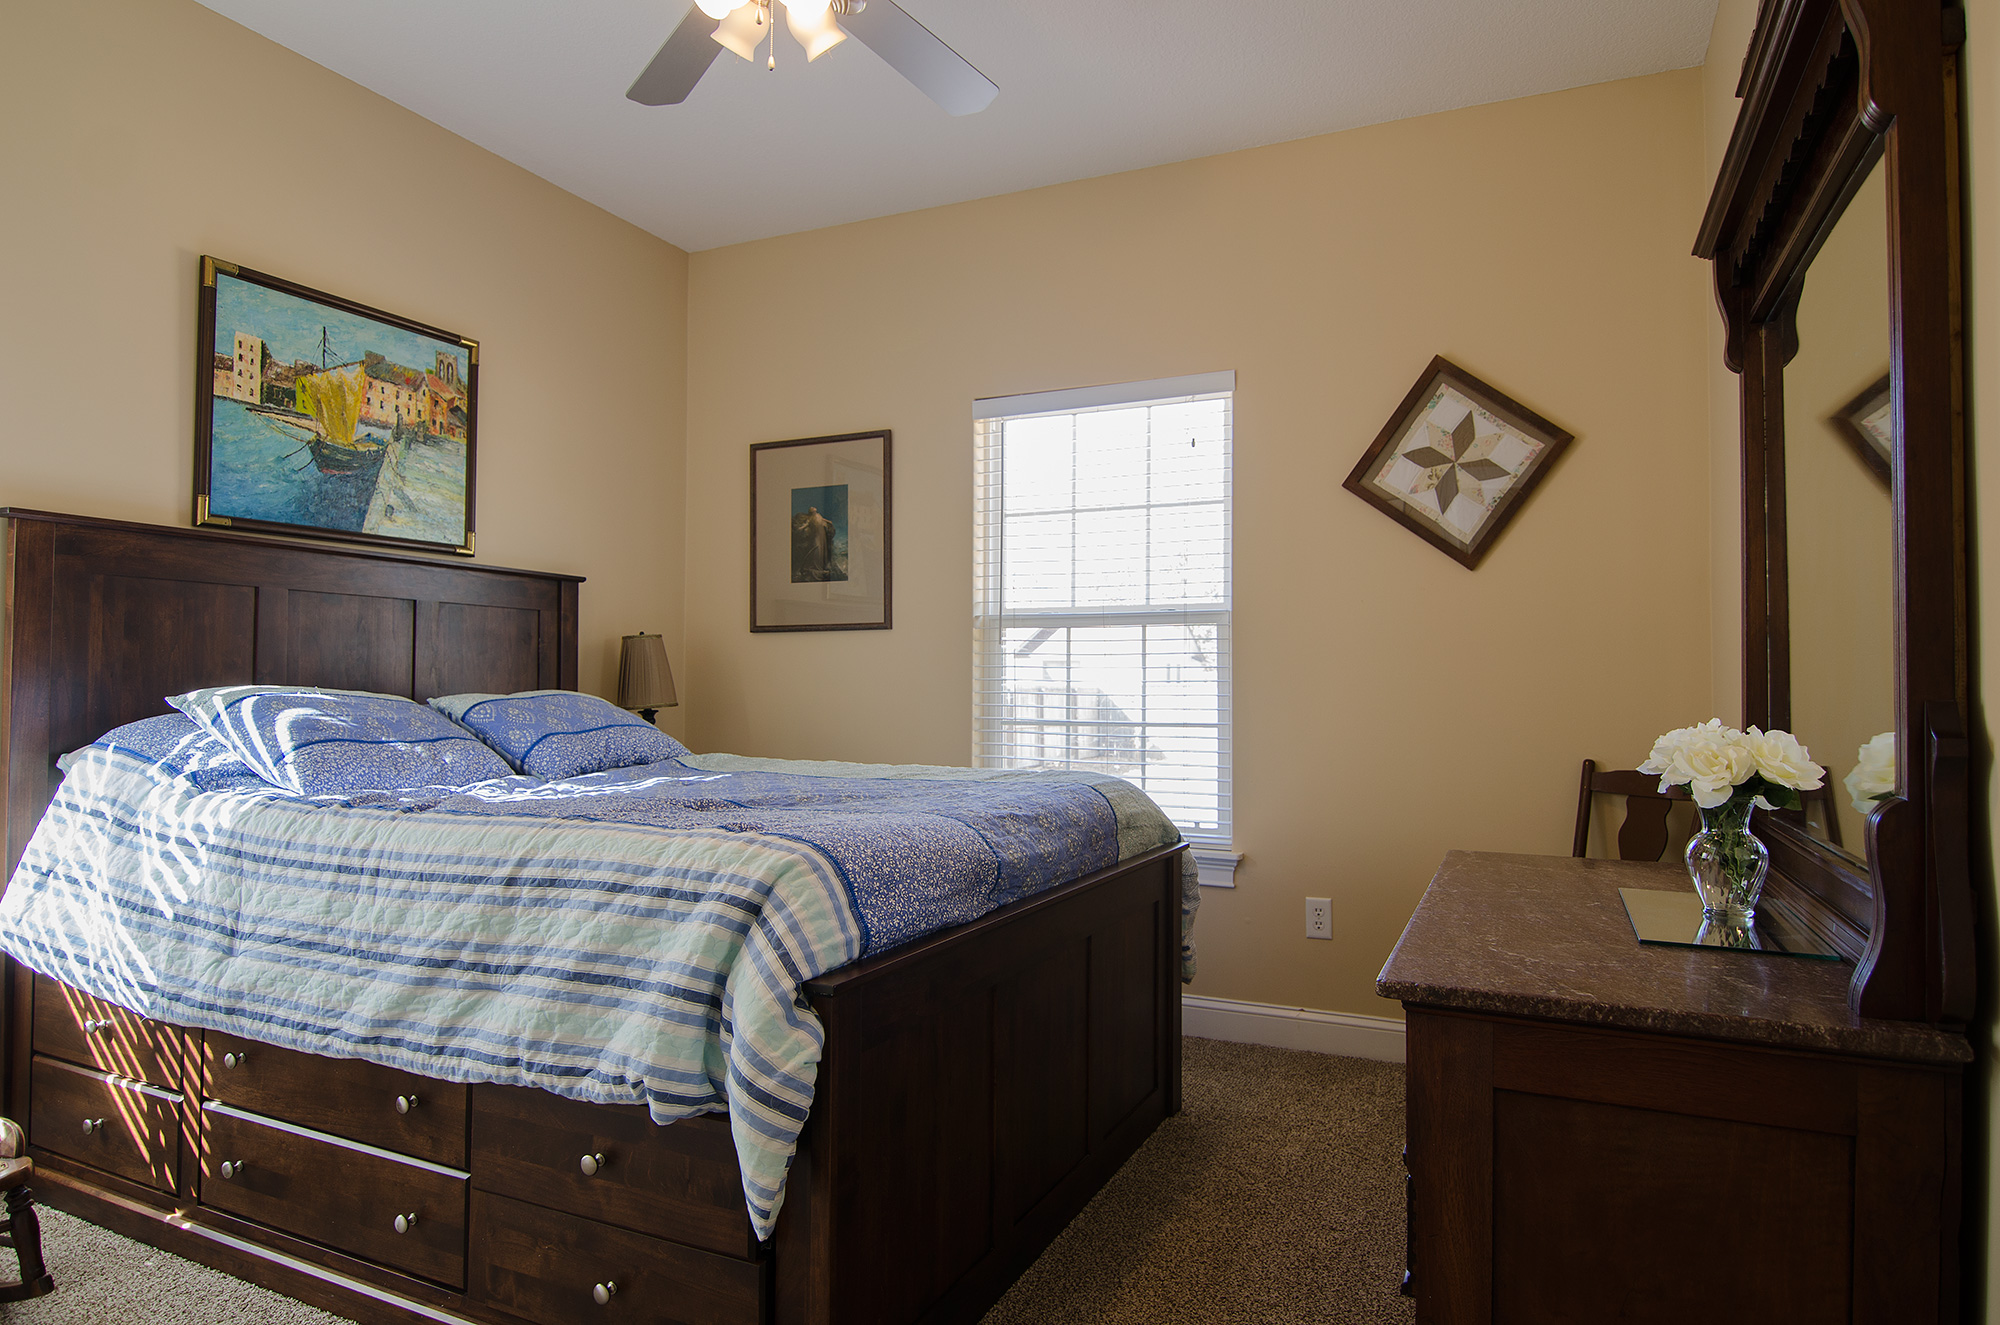 3riversrealty,-bainbridge-home-for-sale,boxwood-drive,mills-brock,randee-eubanks,bedroom3.jpg